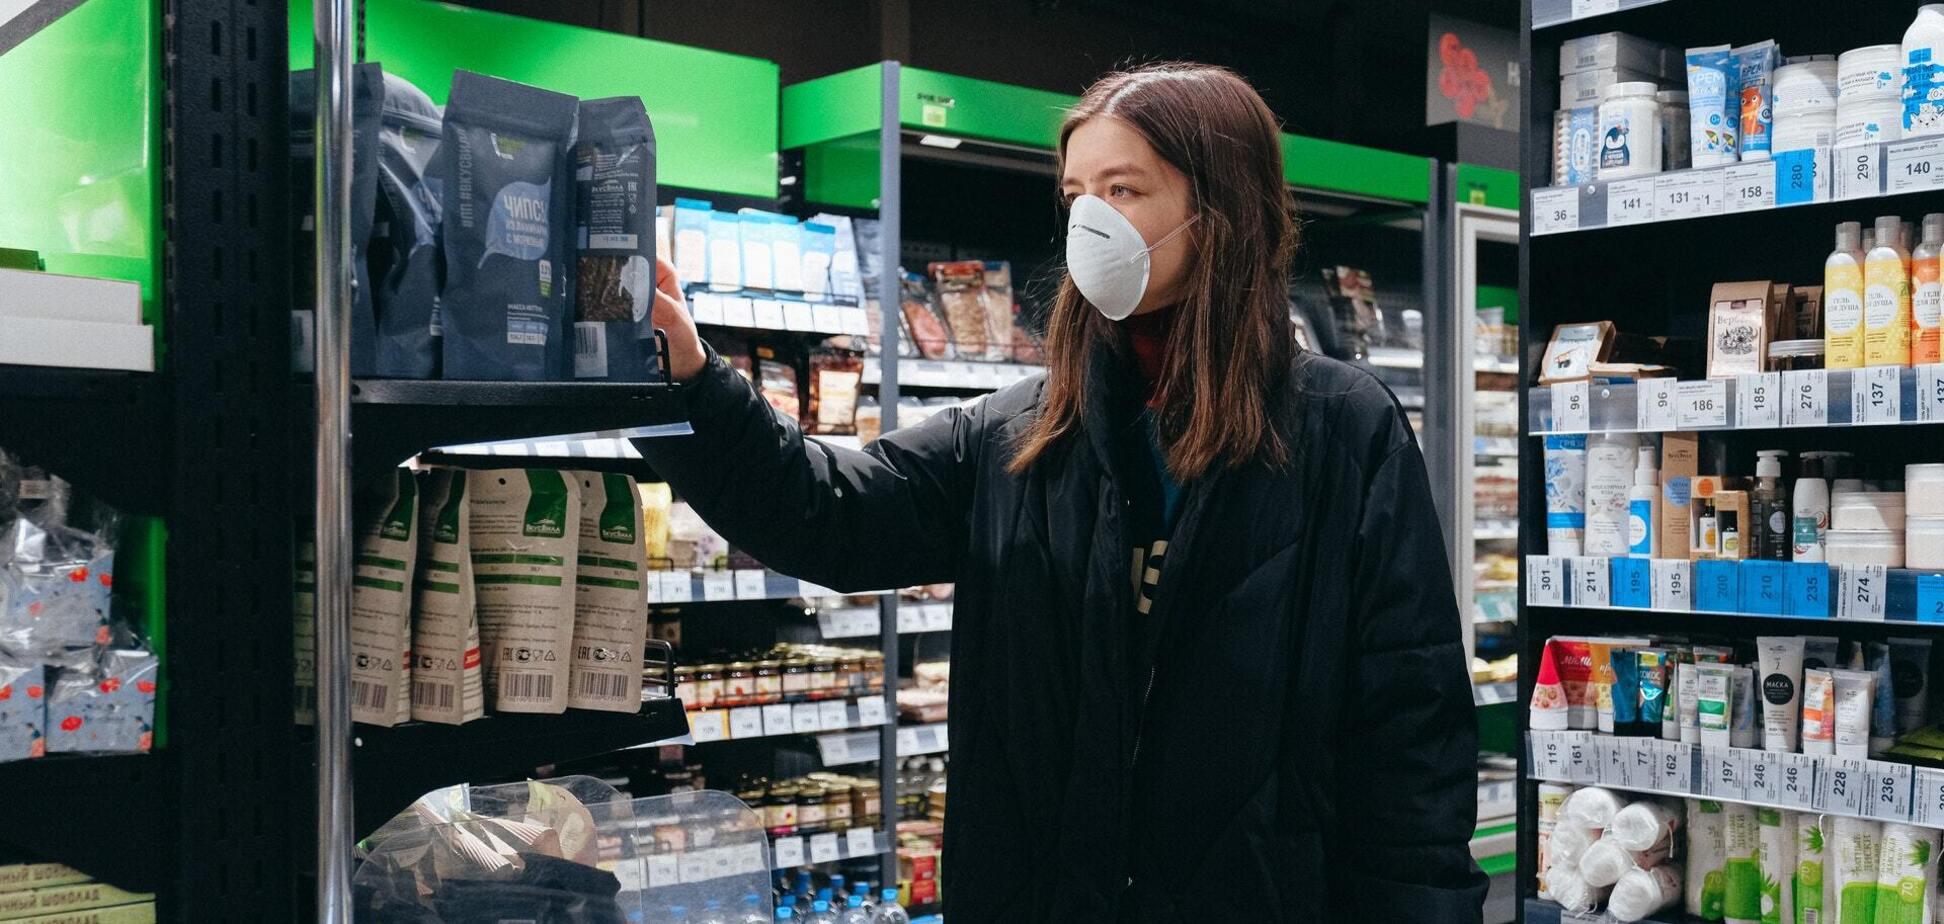 Супермаркет в карантин